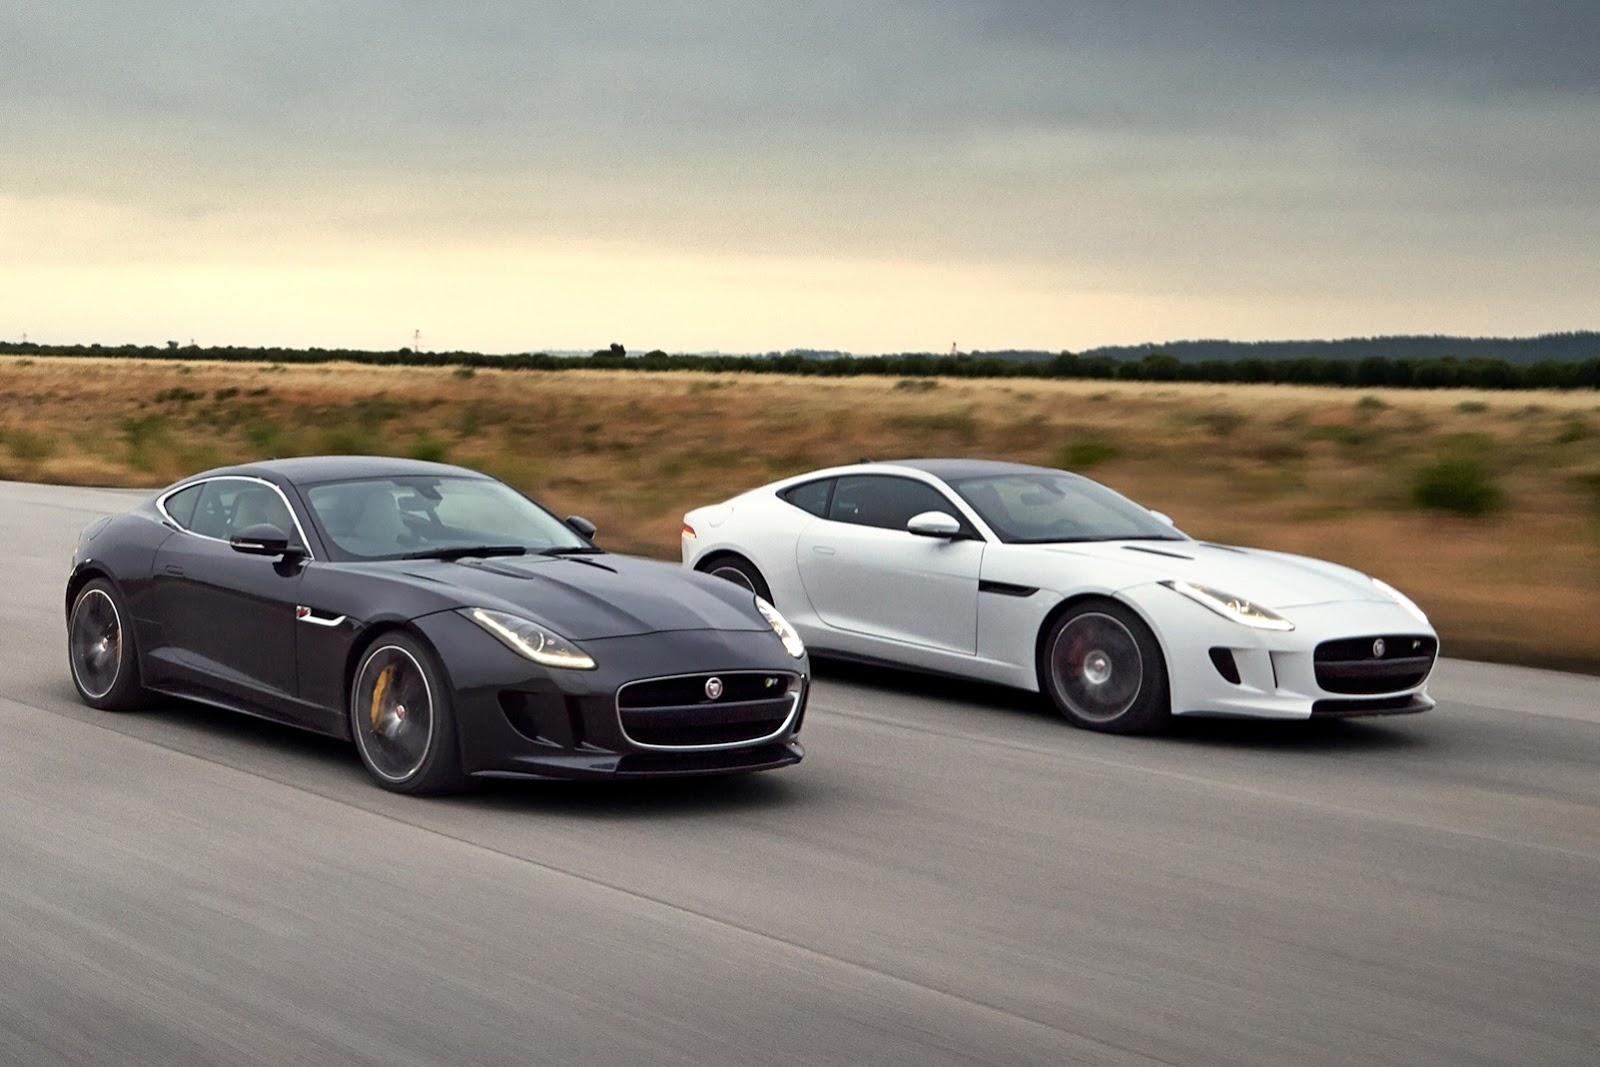 New Jaguar F-Type Coupe photo galleryJaguar F Type Black Coupe